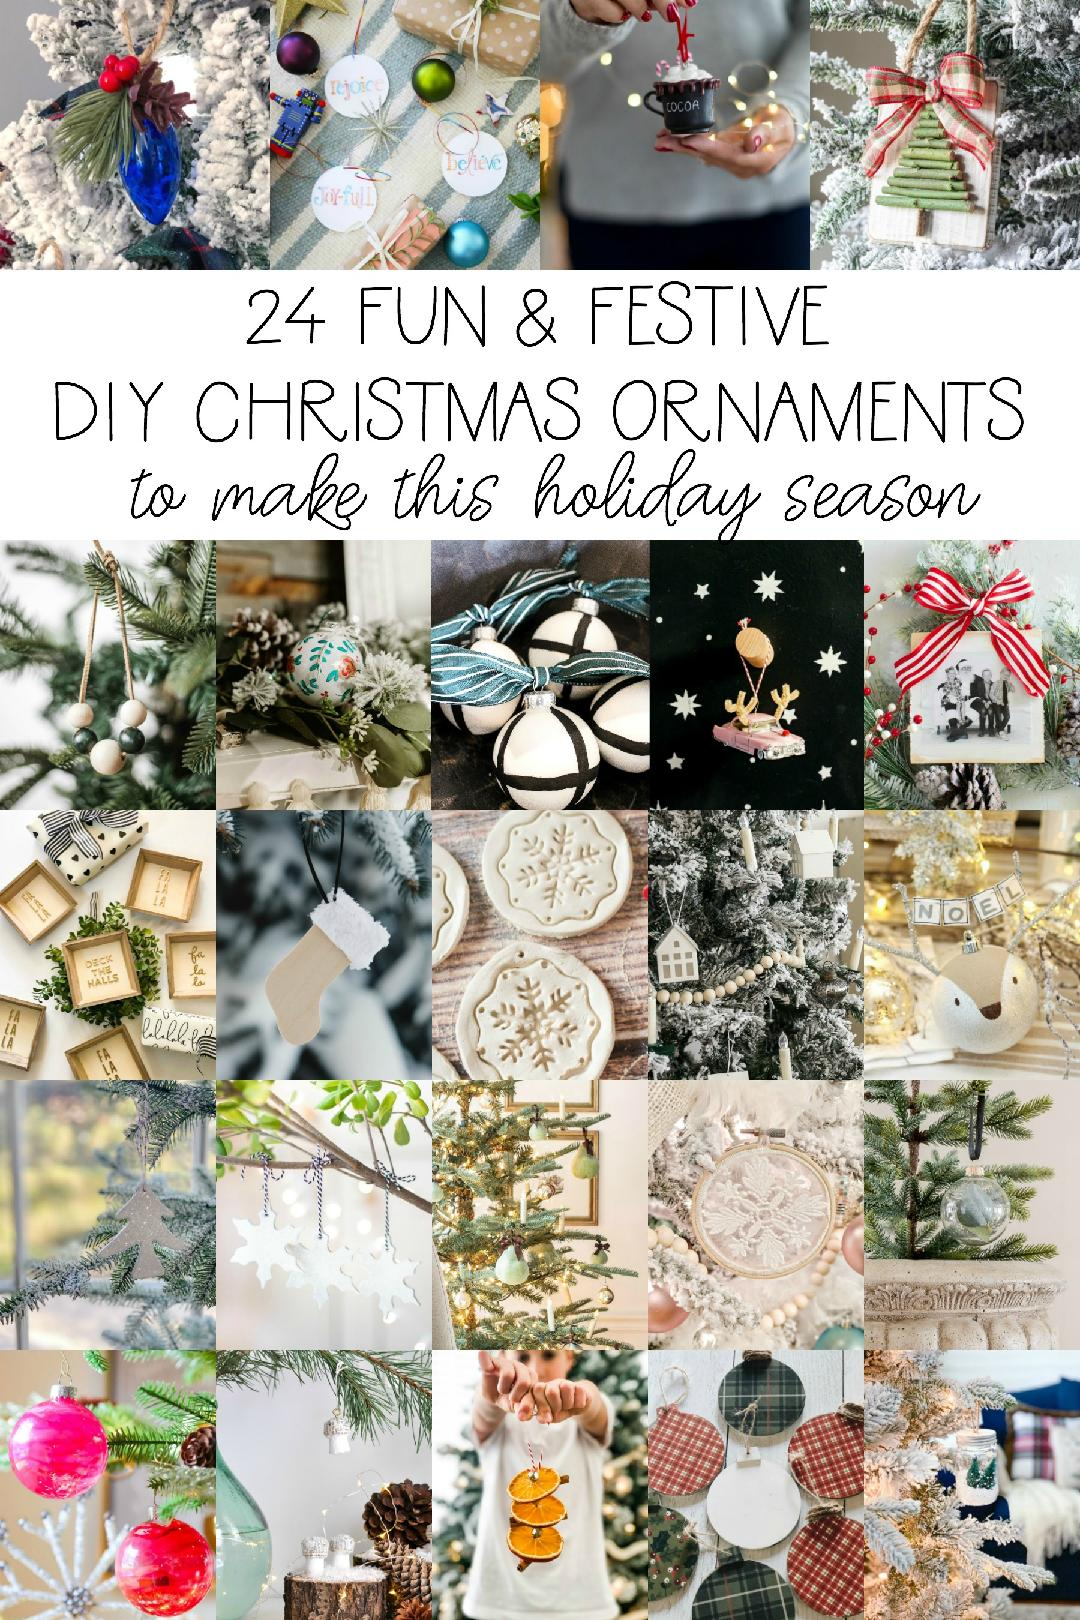 24 fun and festive DIY Christmas ornaments